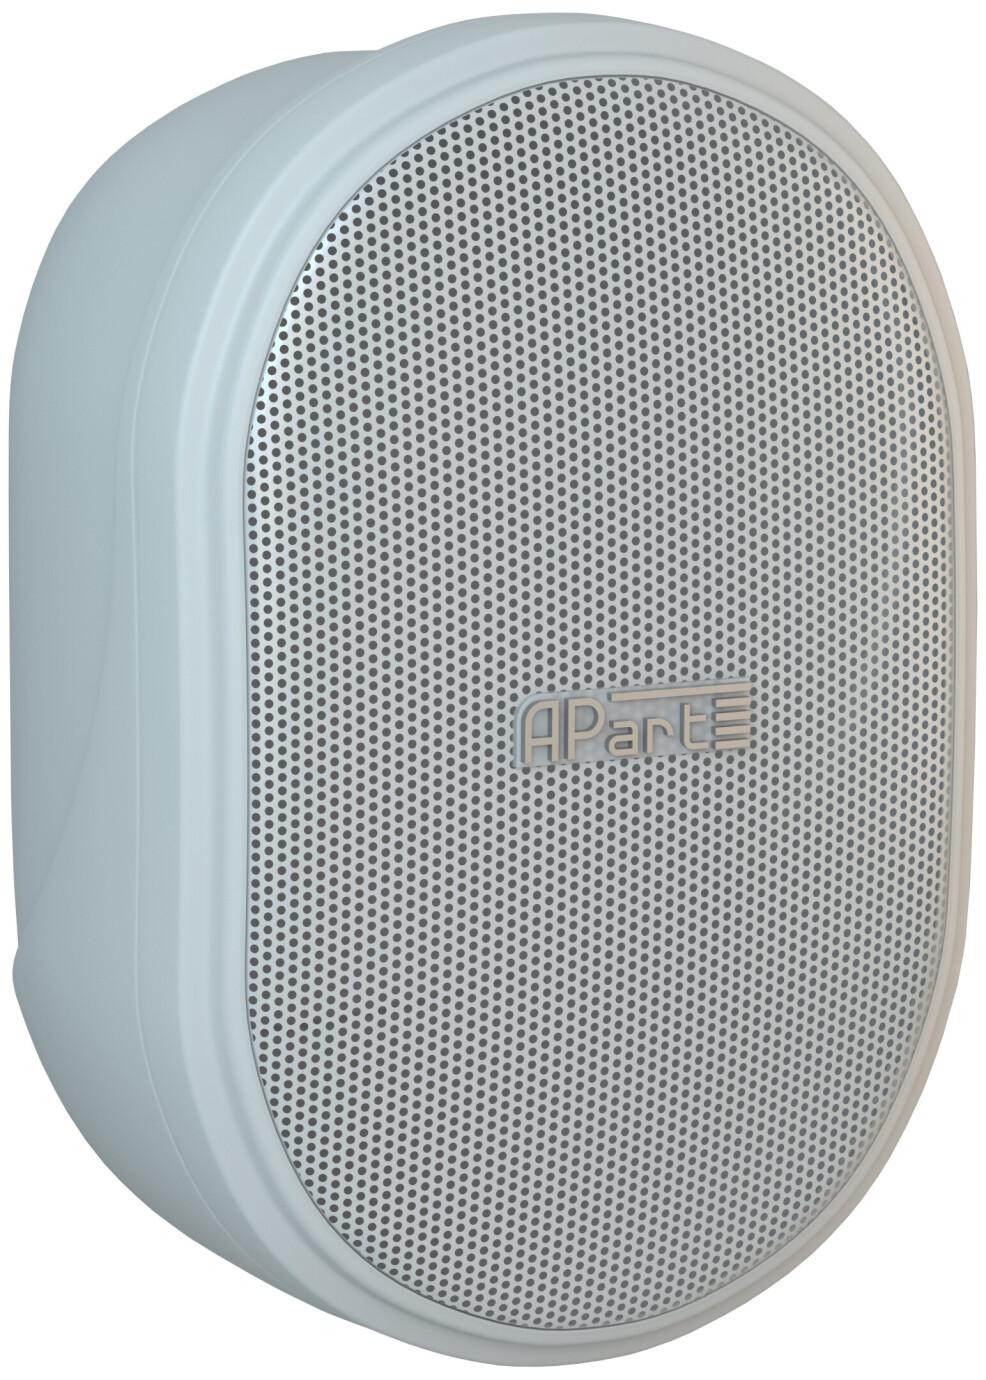 APart OVO3T / 1 par - 100 V 40 W compacto altavoz - Blanco